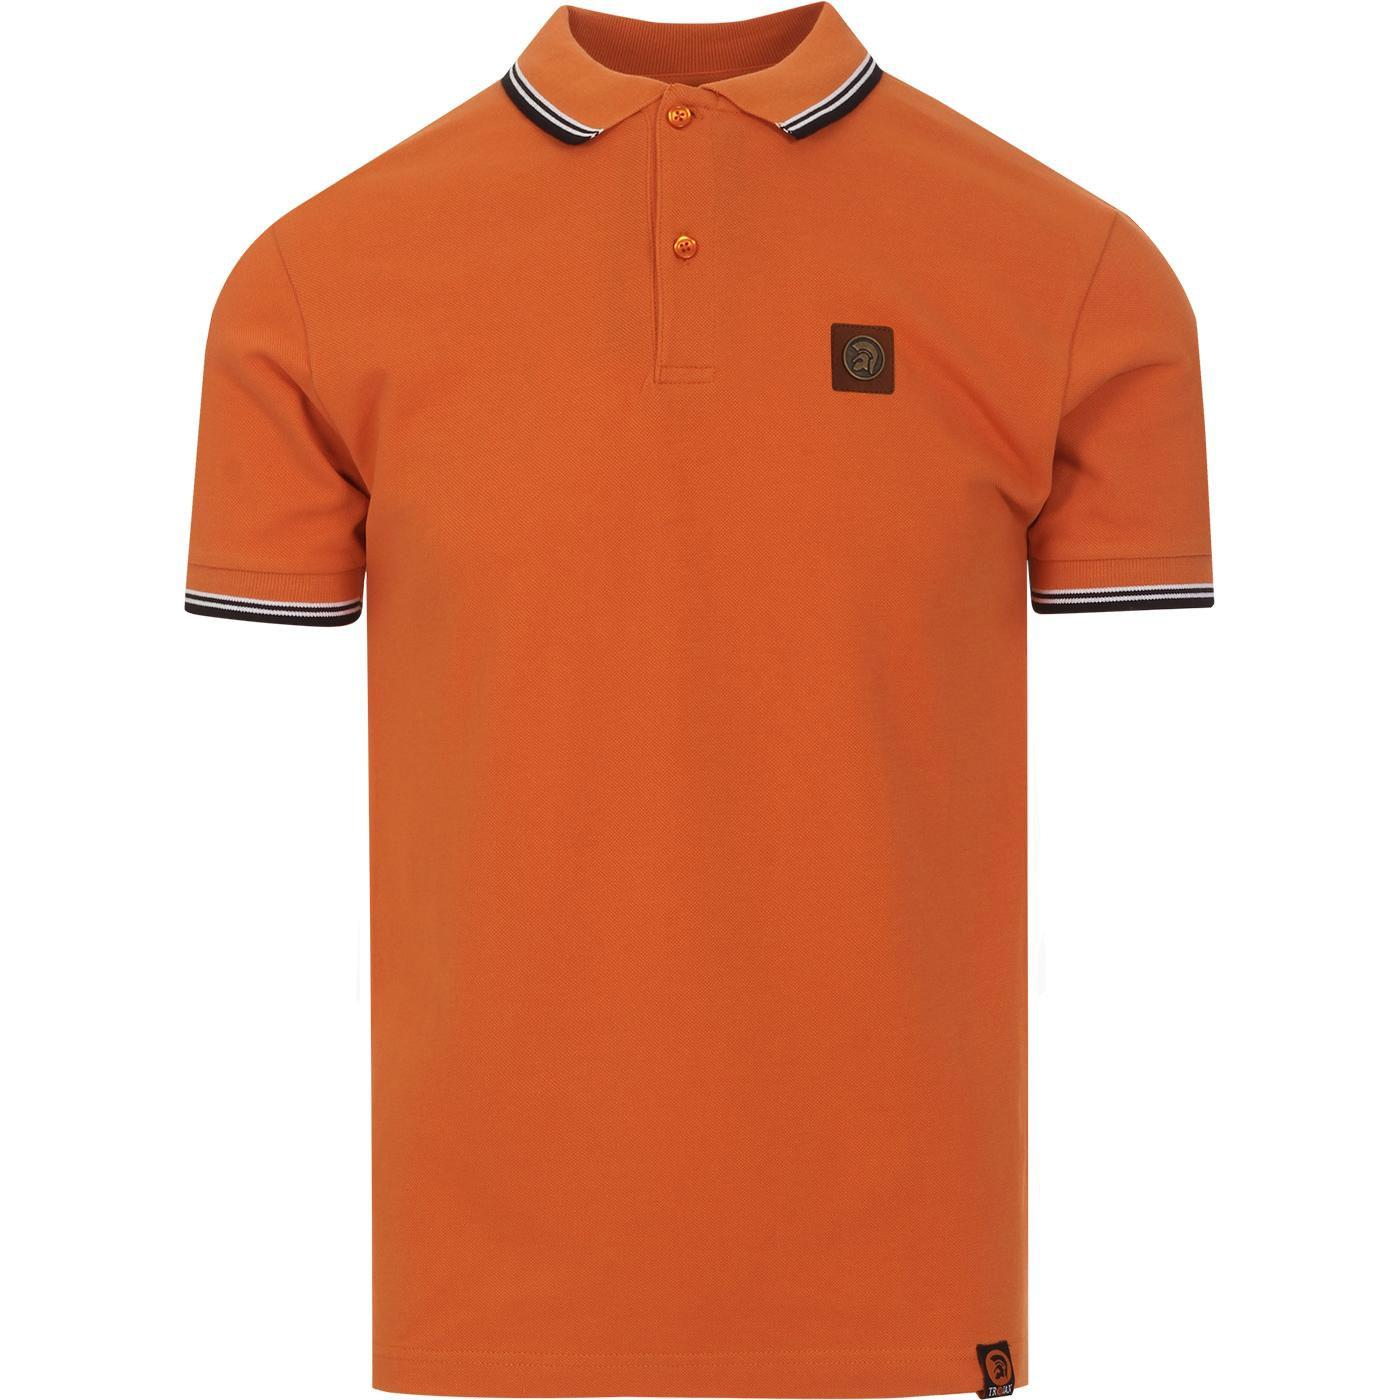 TROJAN RECORDS Classic Mod Tipped Polo (Orange)